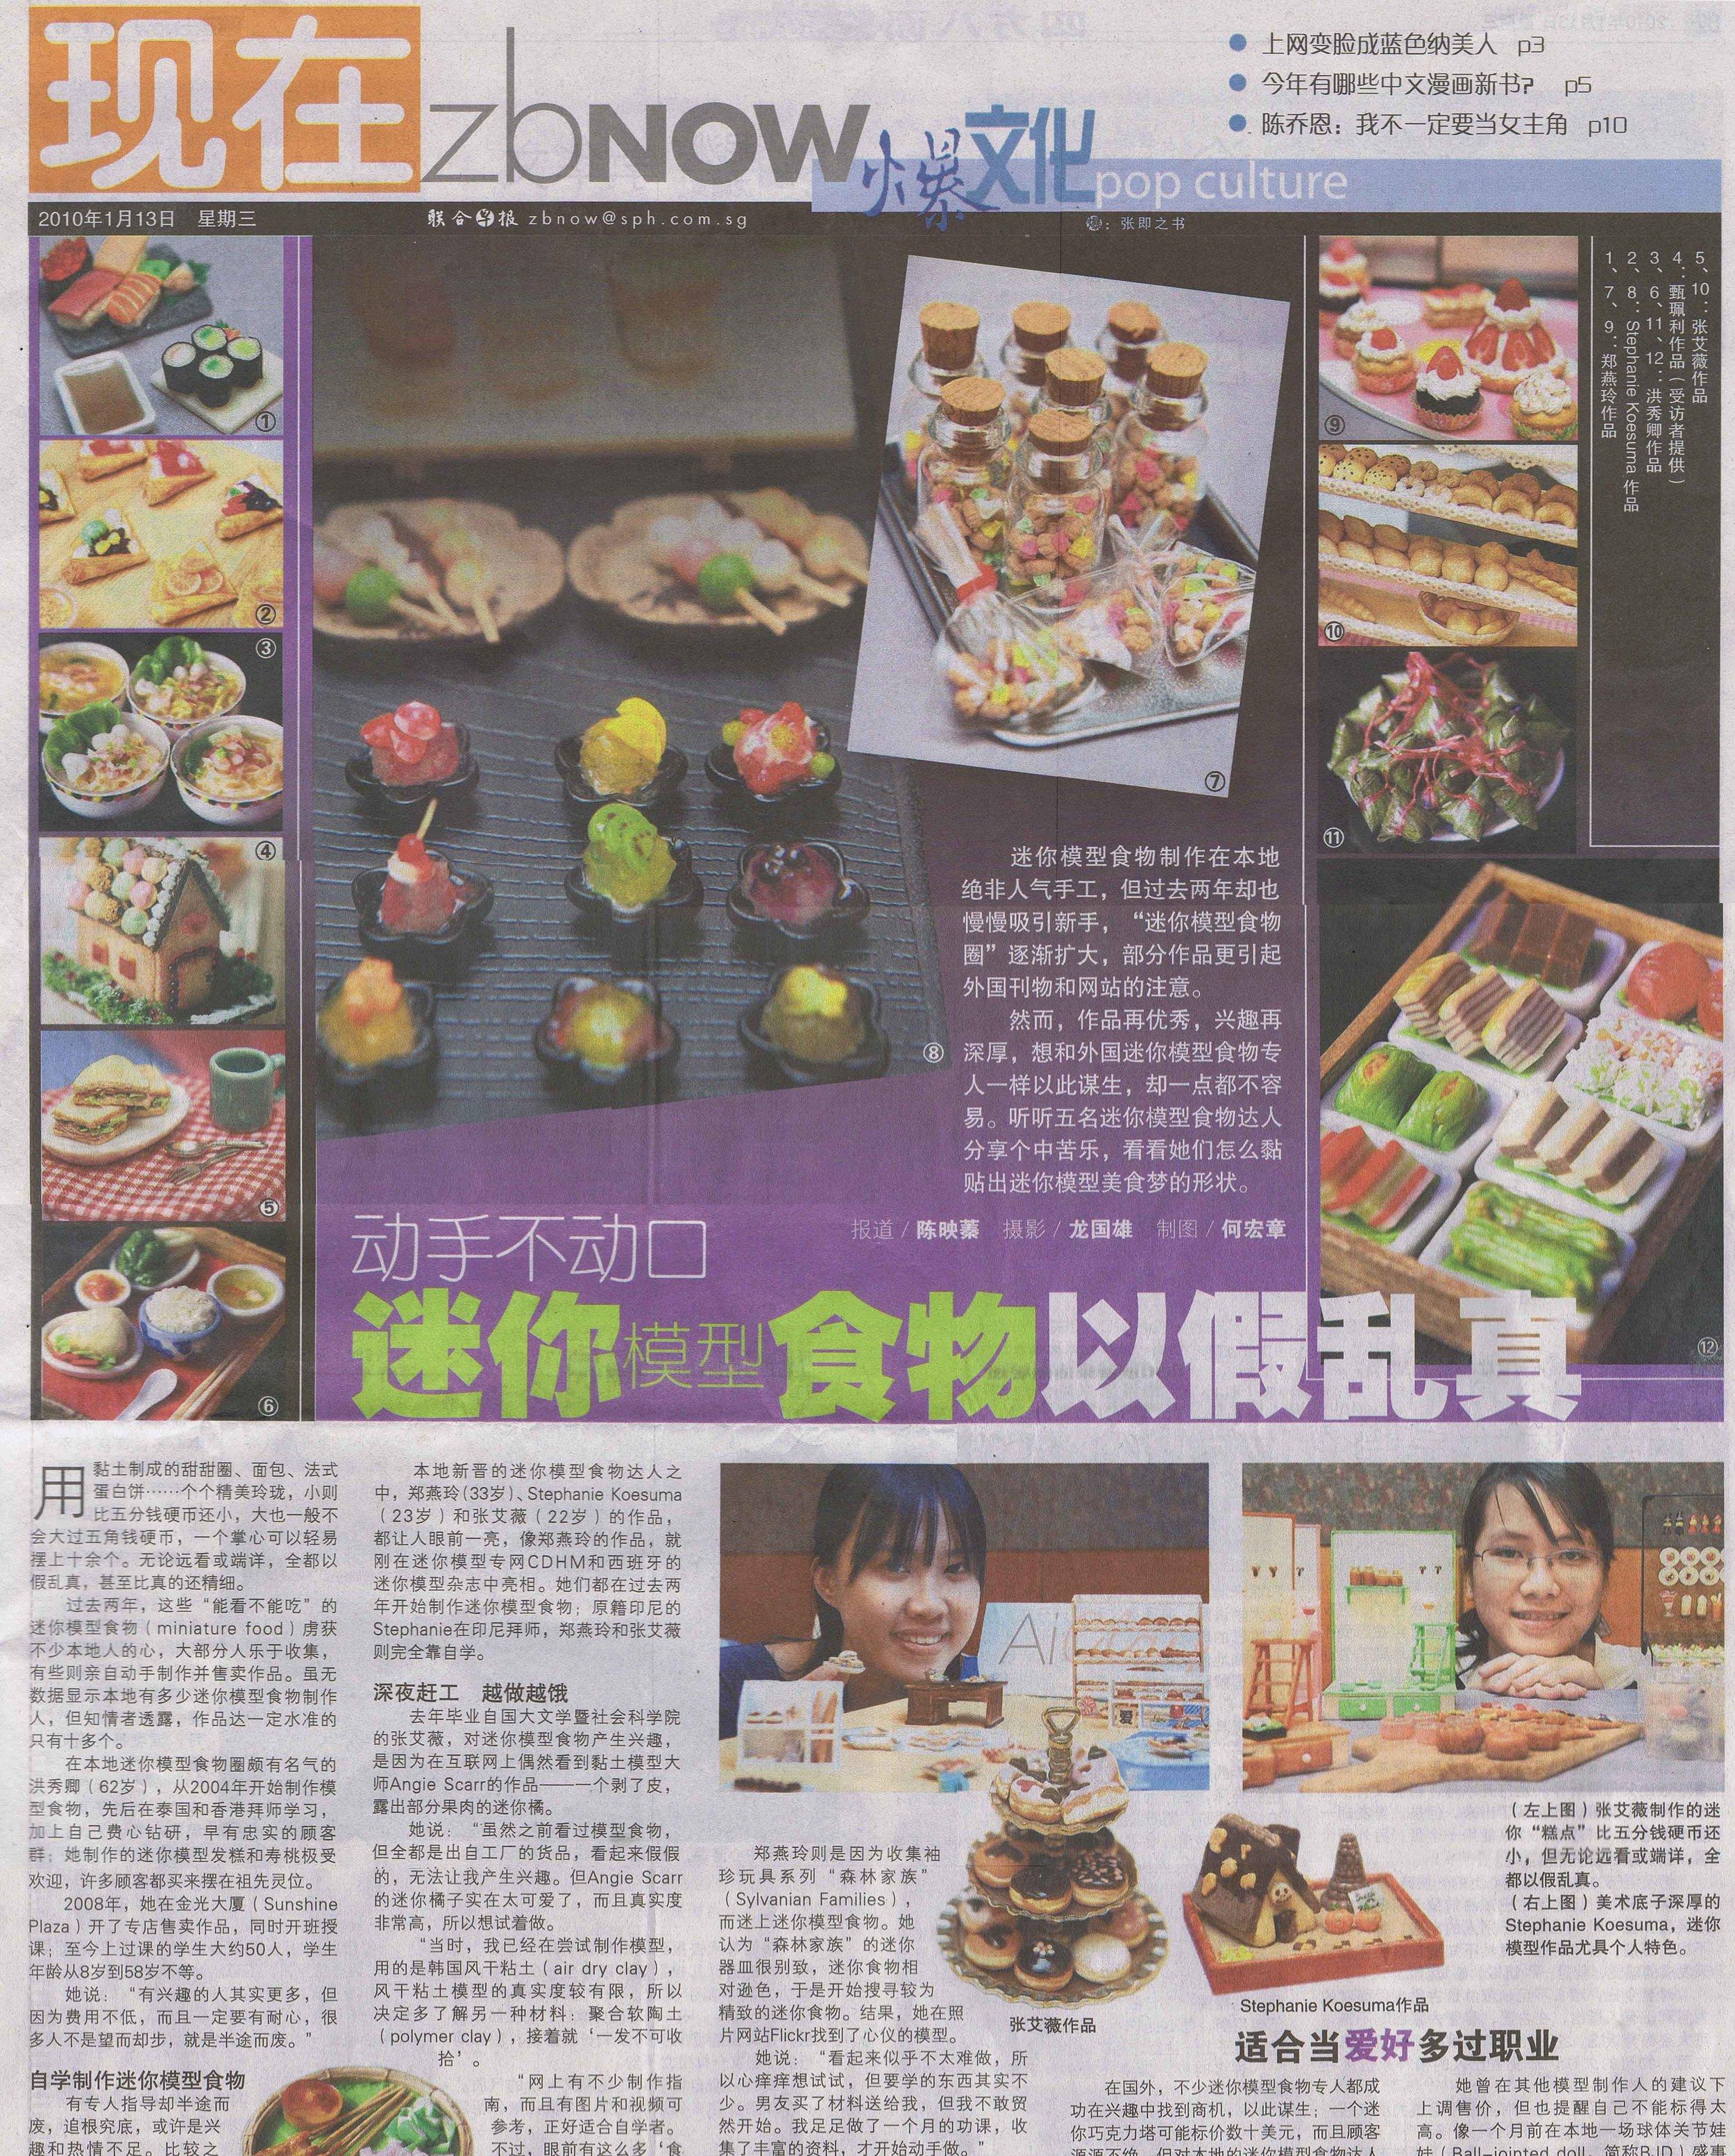 Lianhe Zaobao 联合早报(13 Jan 2010) -